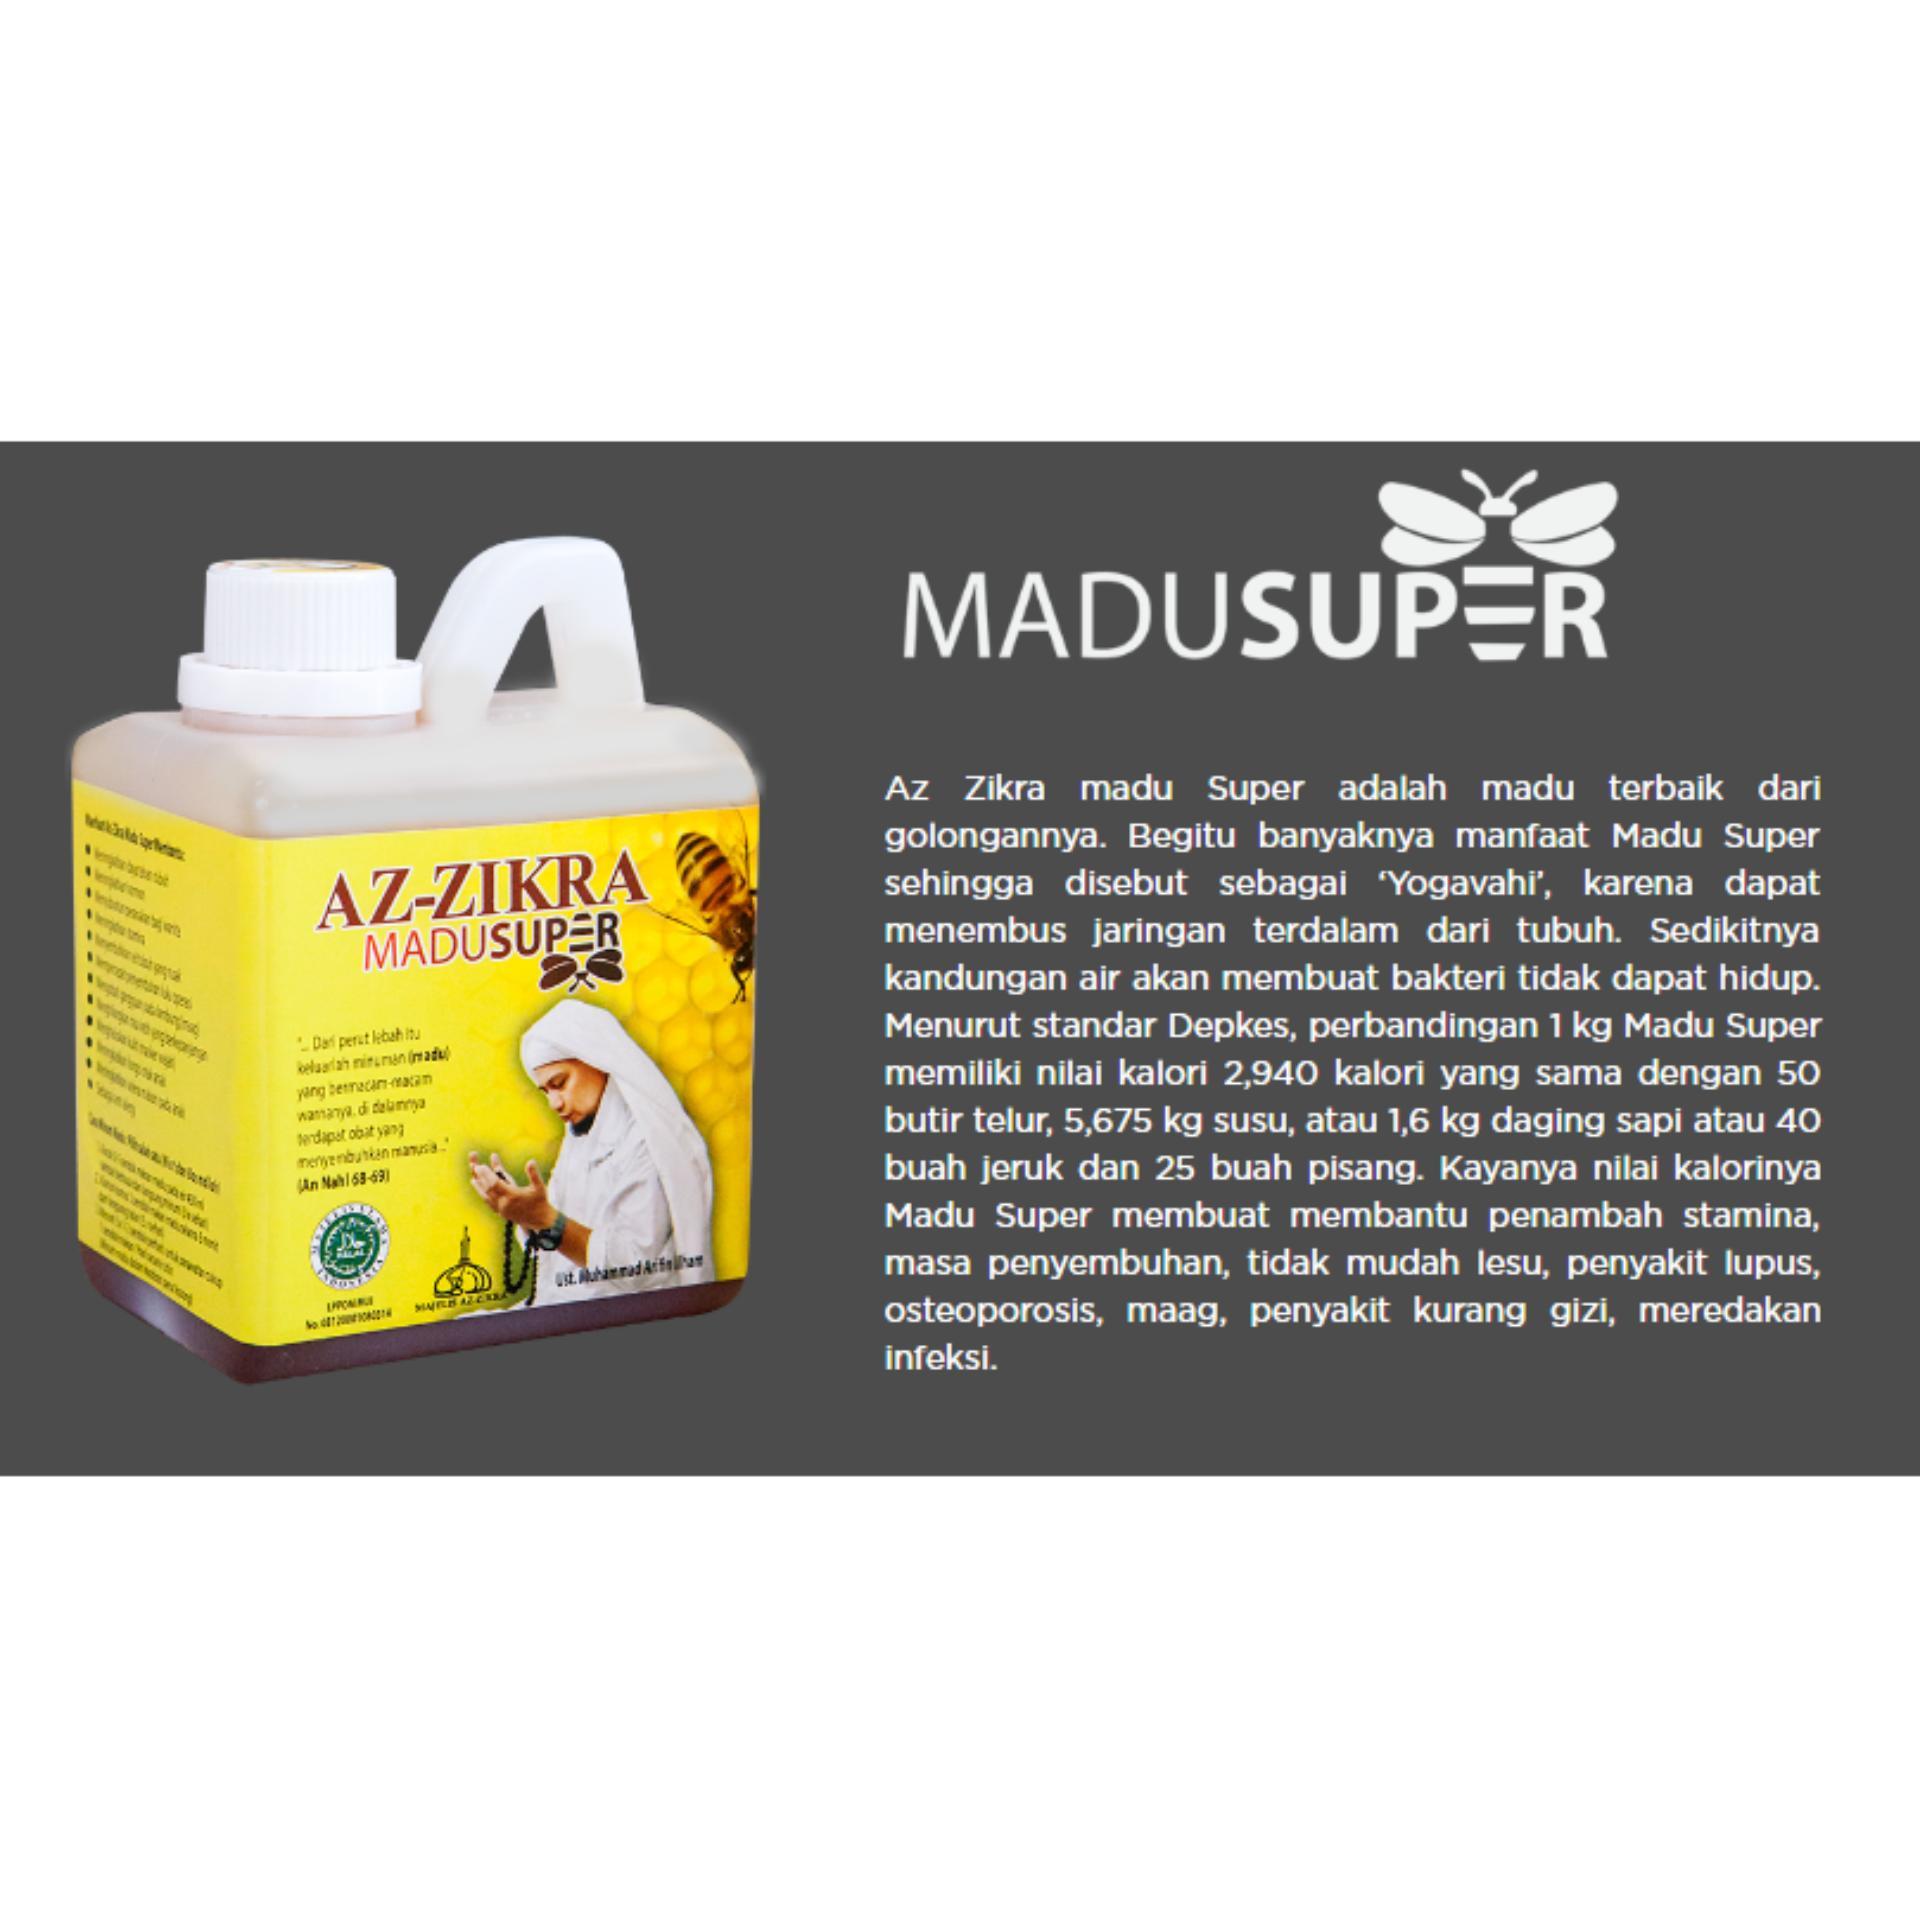 Jual Produk Az Zikra Online Terbaru Di Madu Super 500 Gram Aseli Meningkatkan Stamina Tubuh Dan Segar Bugar Berkah Doa Kh Arifin Ilham